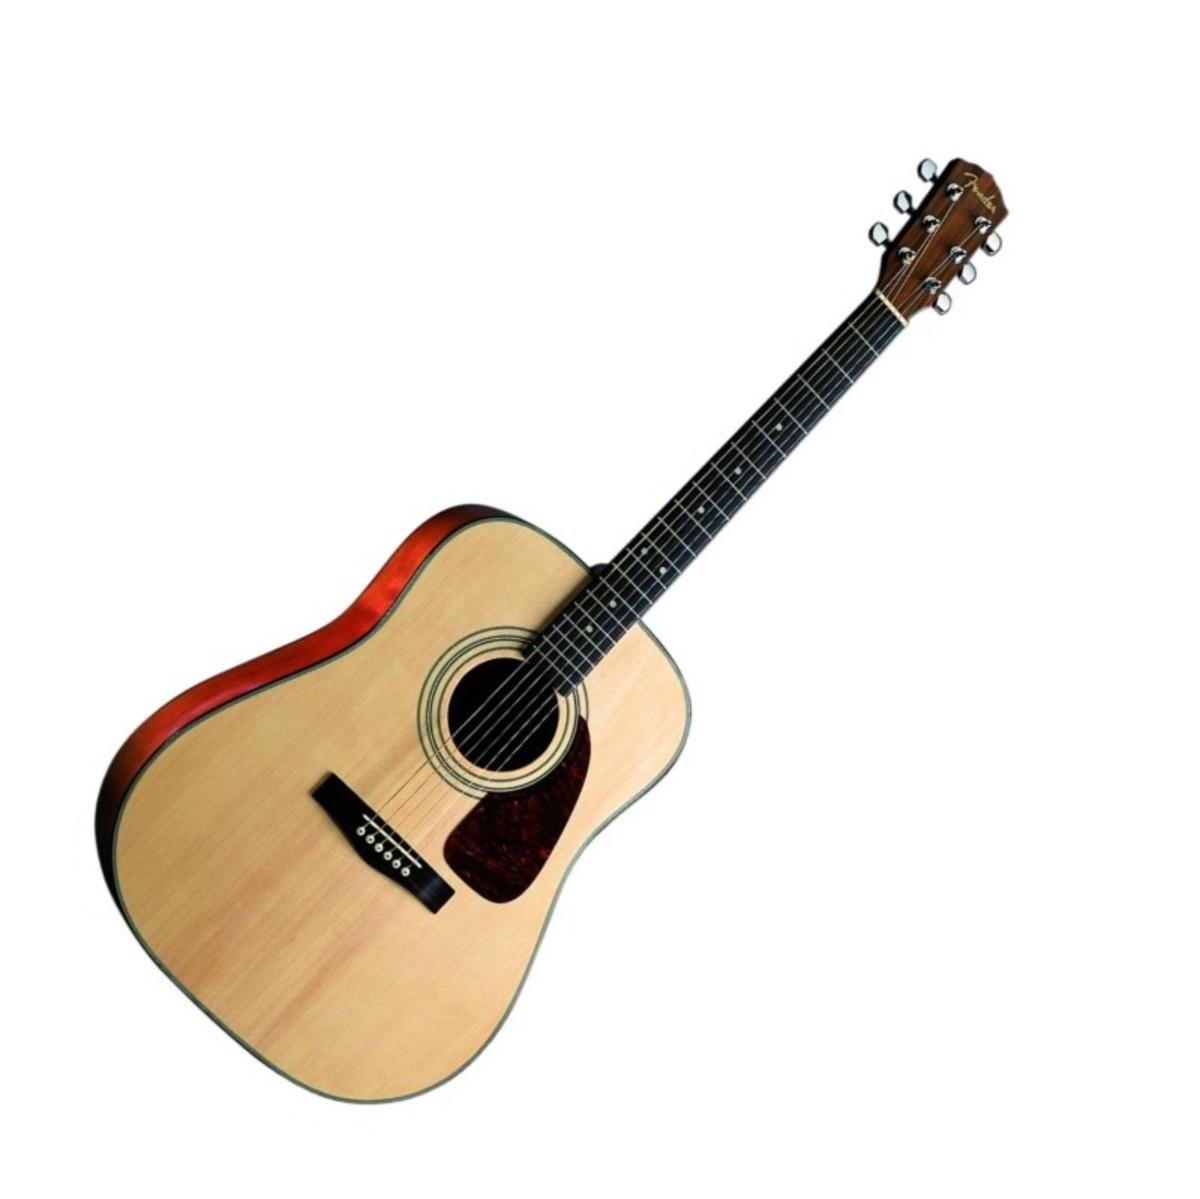 top-five-acoustic-steel-string-guitars-for-under-five-hundred-dollars